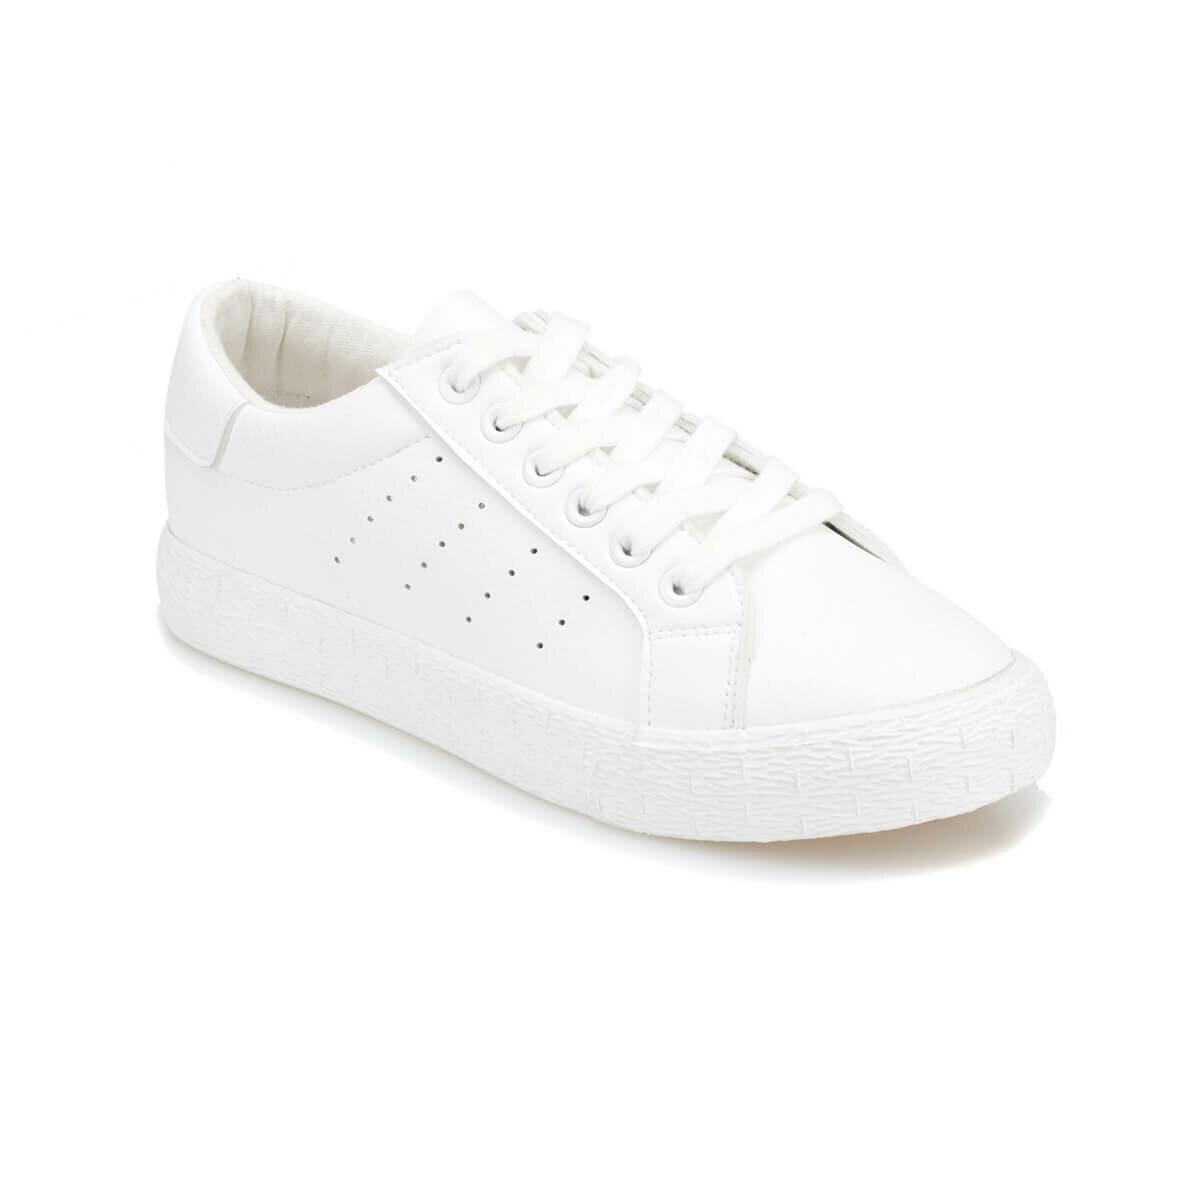 FLO POLIN White Women 'S Sneaker Shoes KINETIX